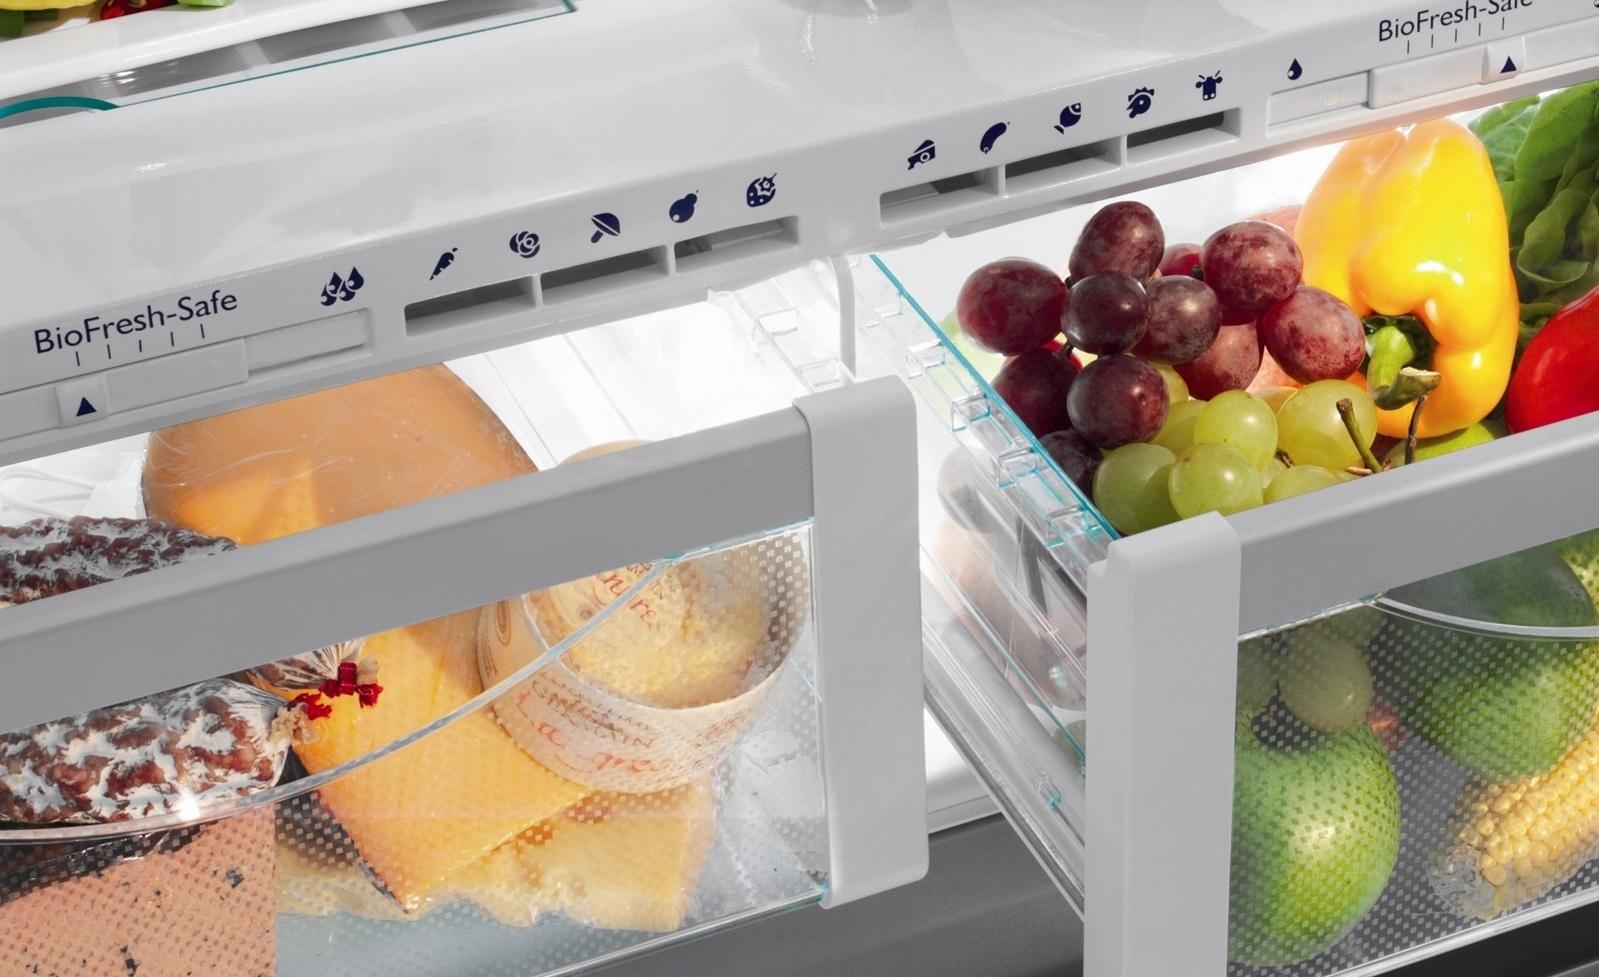 морозилка класс заморозки продуктов